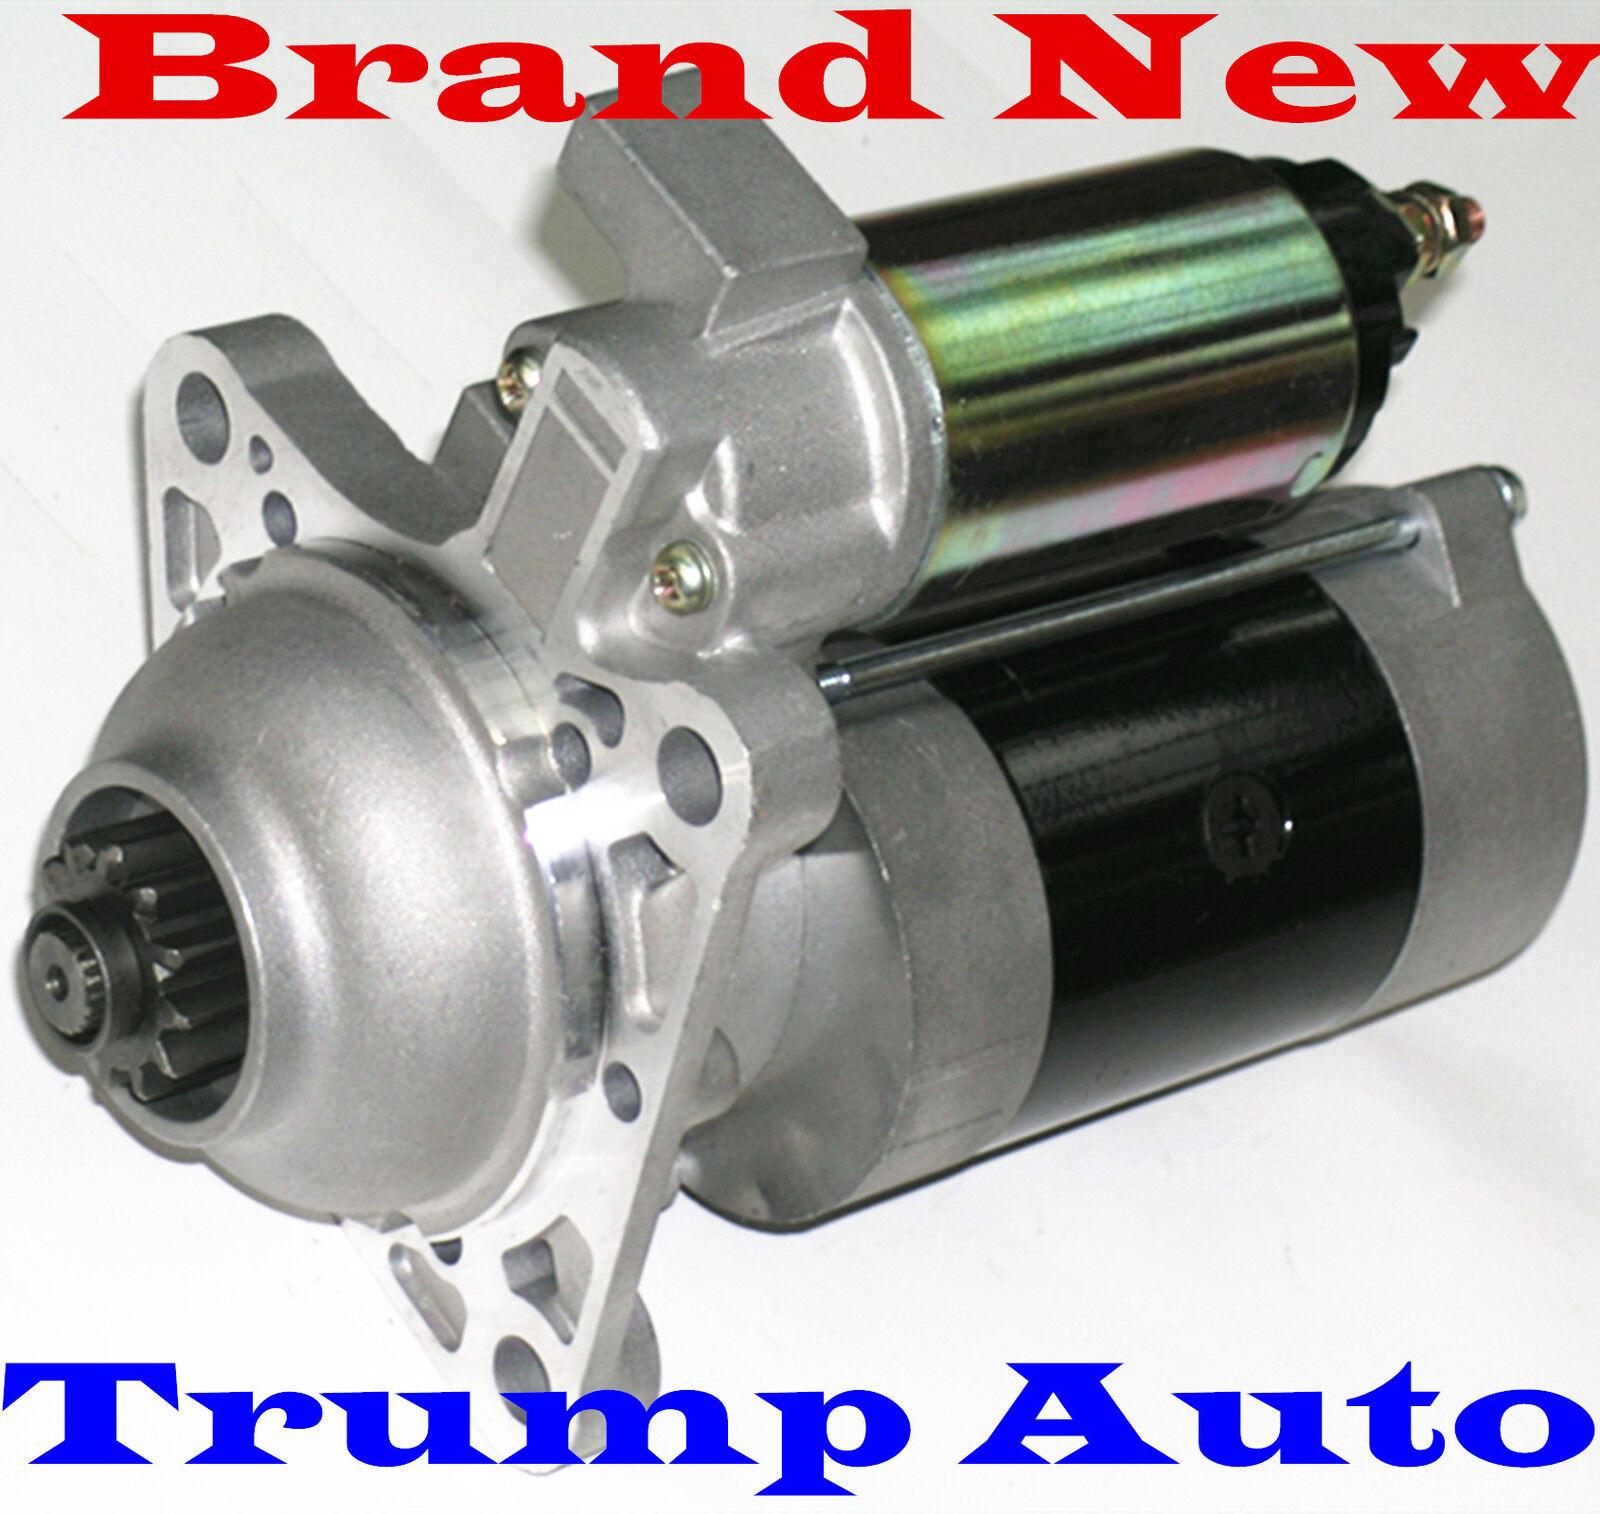 Trump M2t57671 Ebay Mazda T3500 Fuse Box Norton Secured Powered By Verisign